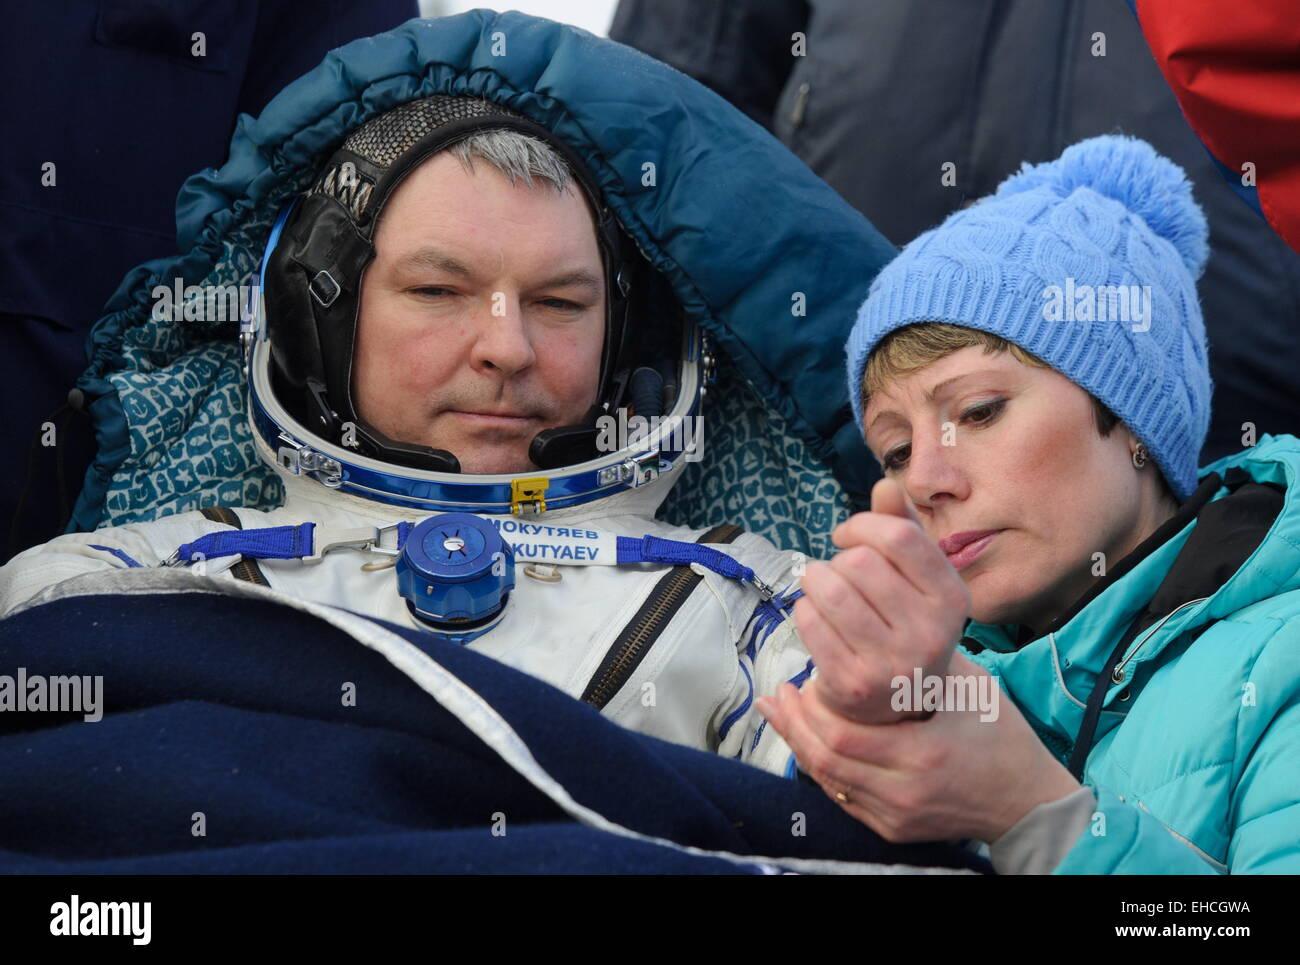 Kazakhstan. 12th March, 2015. ISS Expedition 41/42 crew member, Russia's cosmonaut Alexander Samokutyayev seen - Stock Image